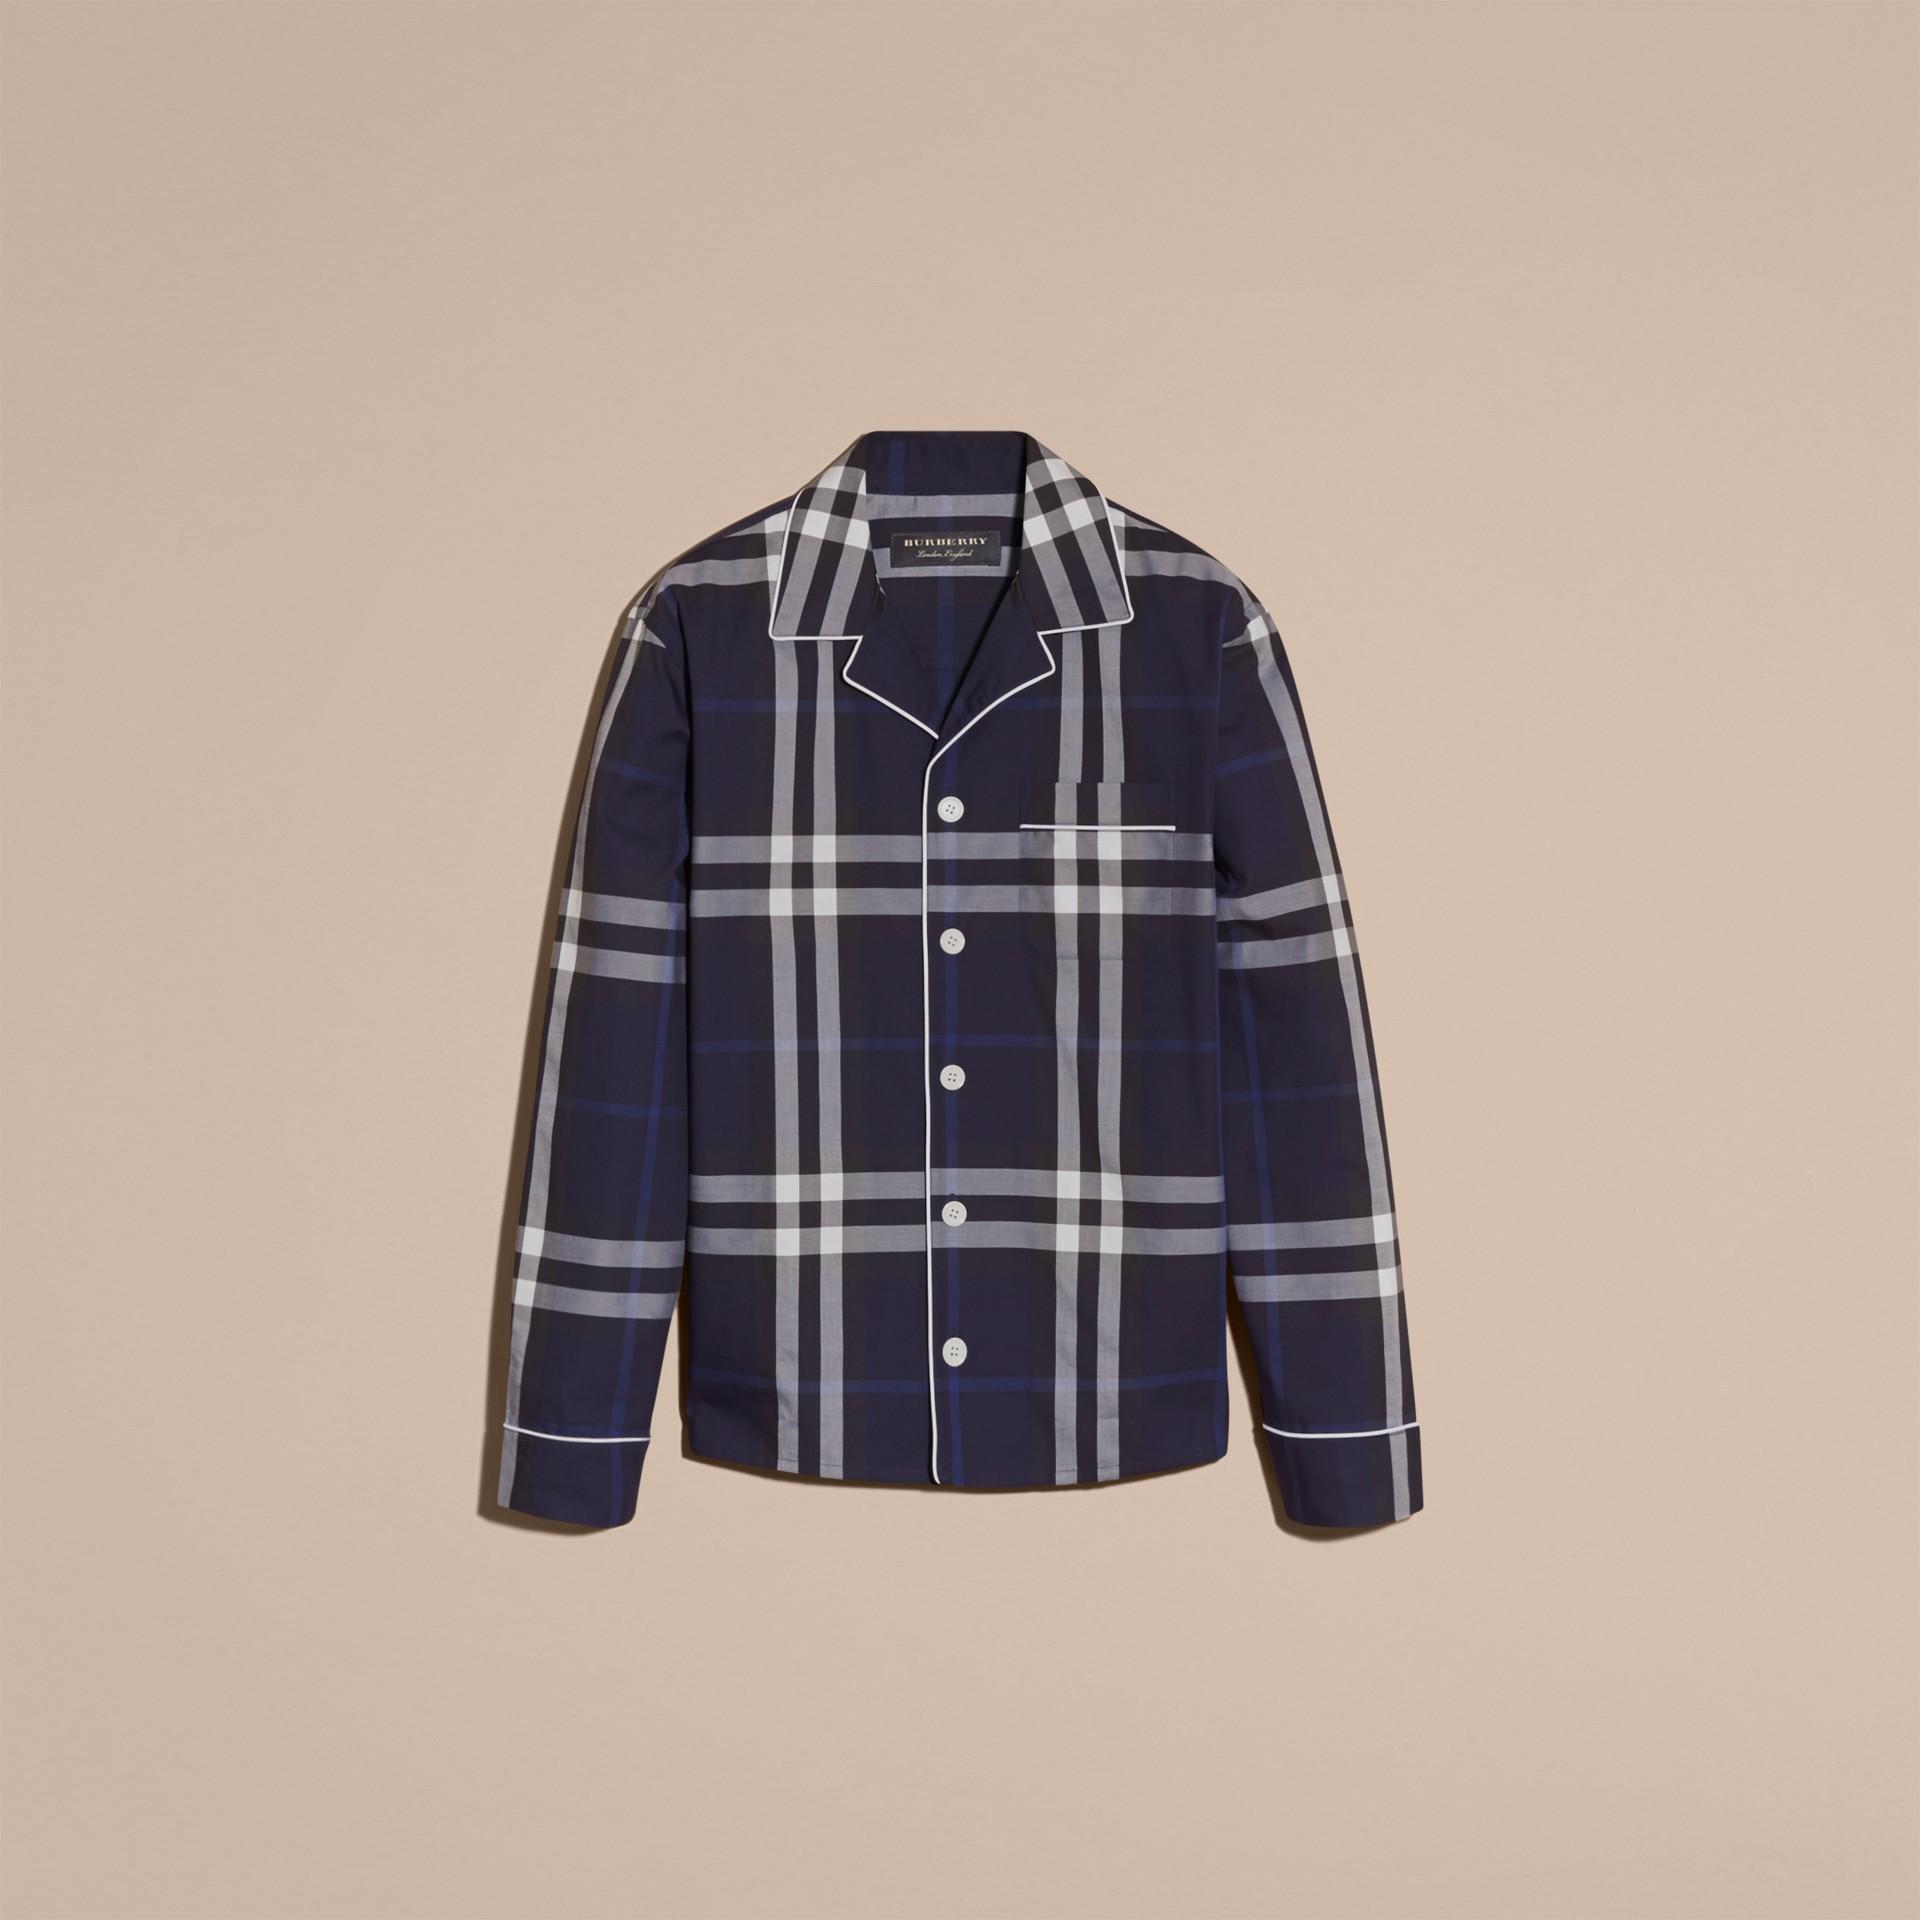 Indigo blue Check Cotton Pyjama-style Shirt Indigo Blue - gallery image 4